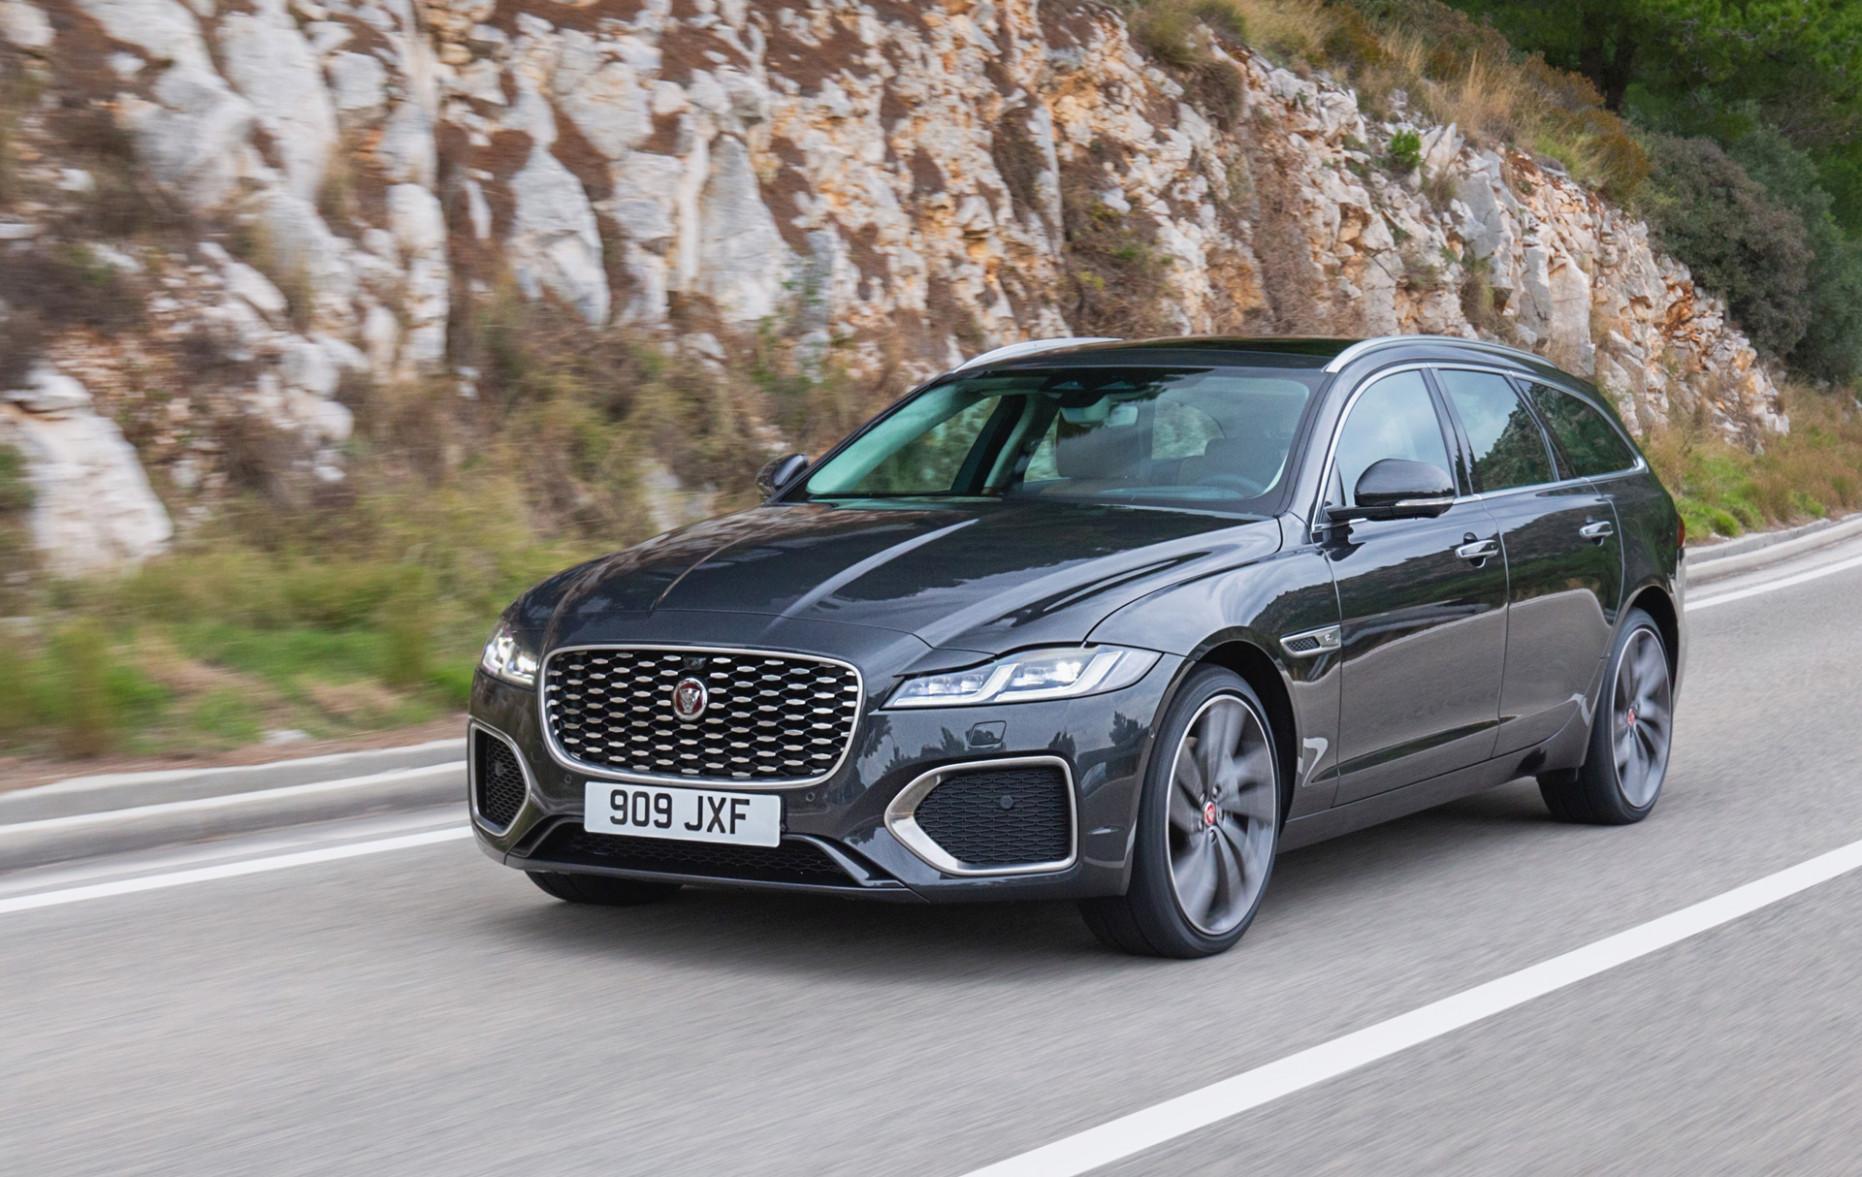 New Model and Performance 2022 All Jaguar Xe Sedan